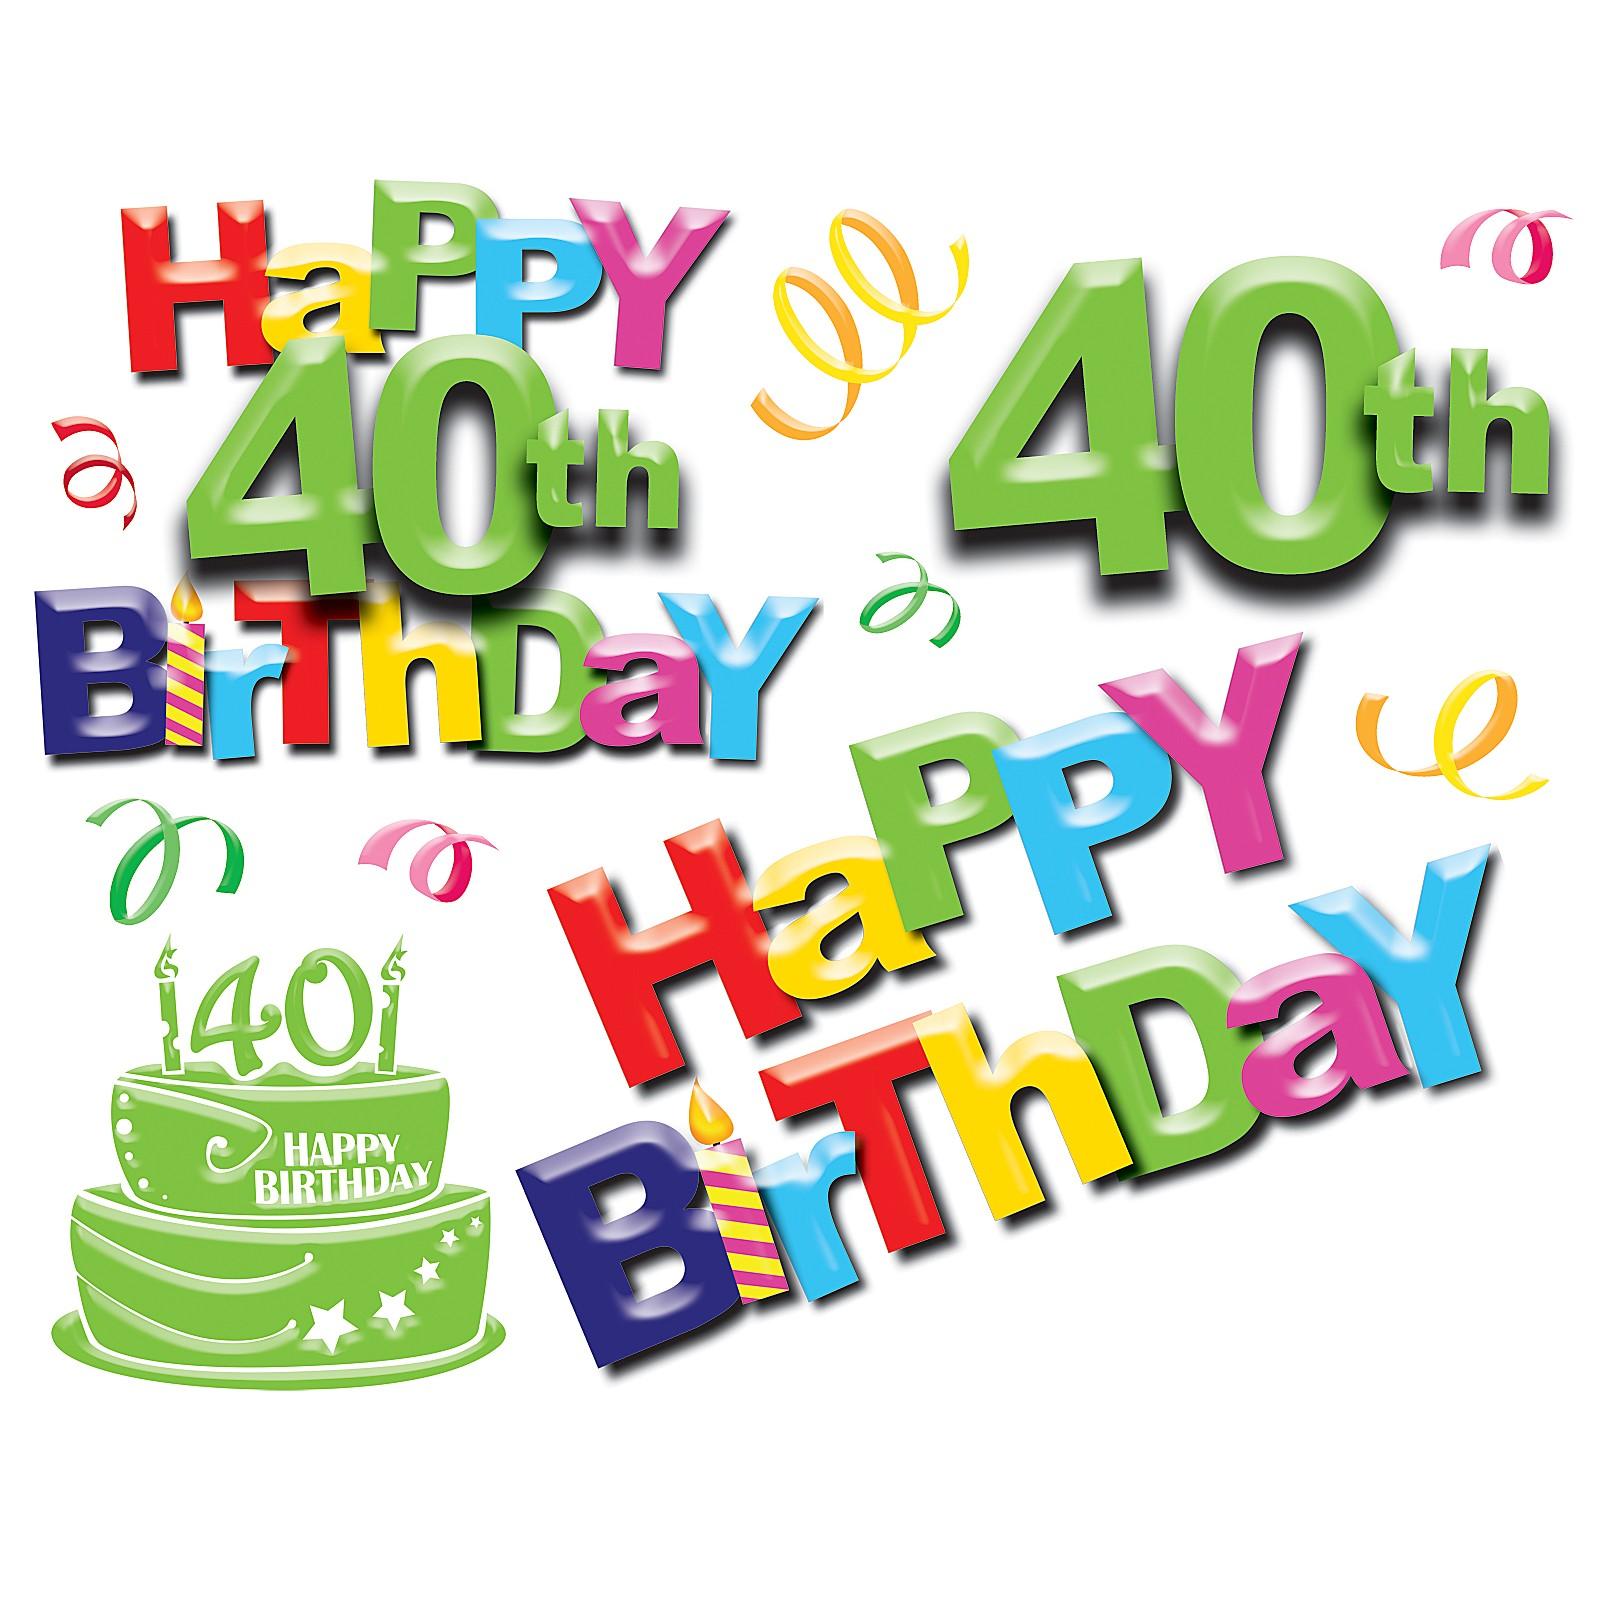 1600x1600 Happy 40th Birthday Clipart Free